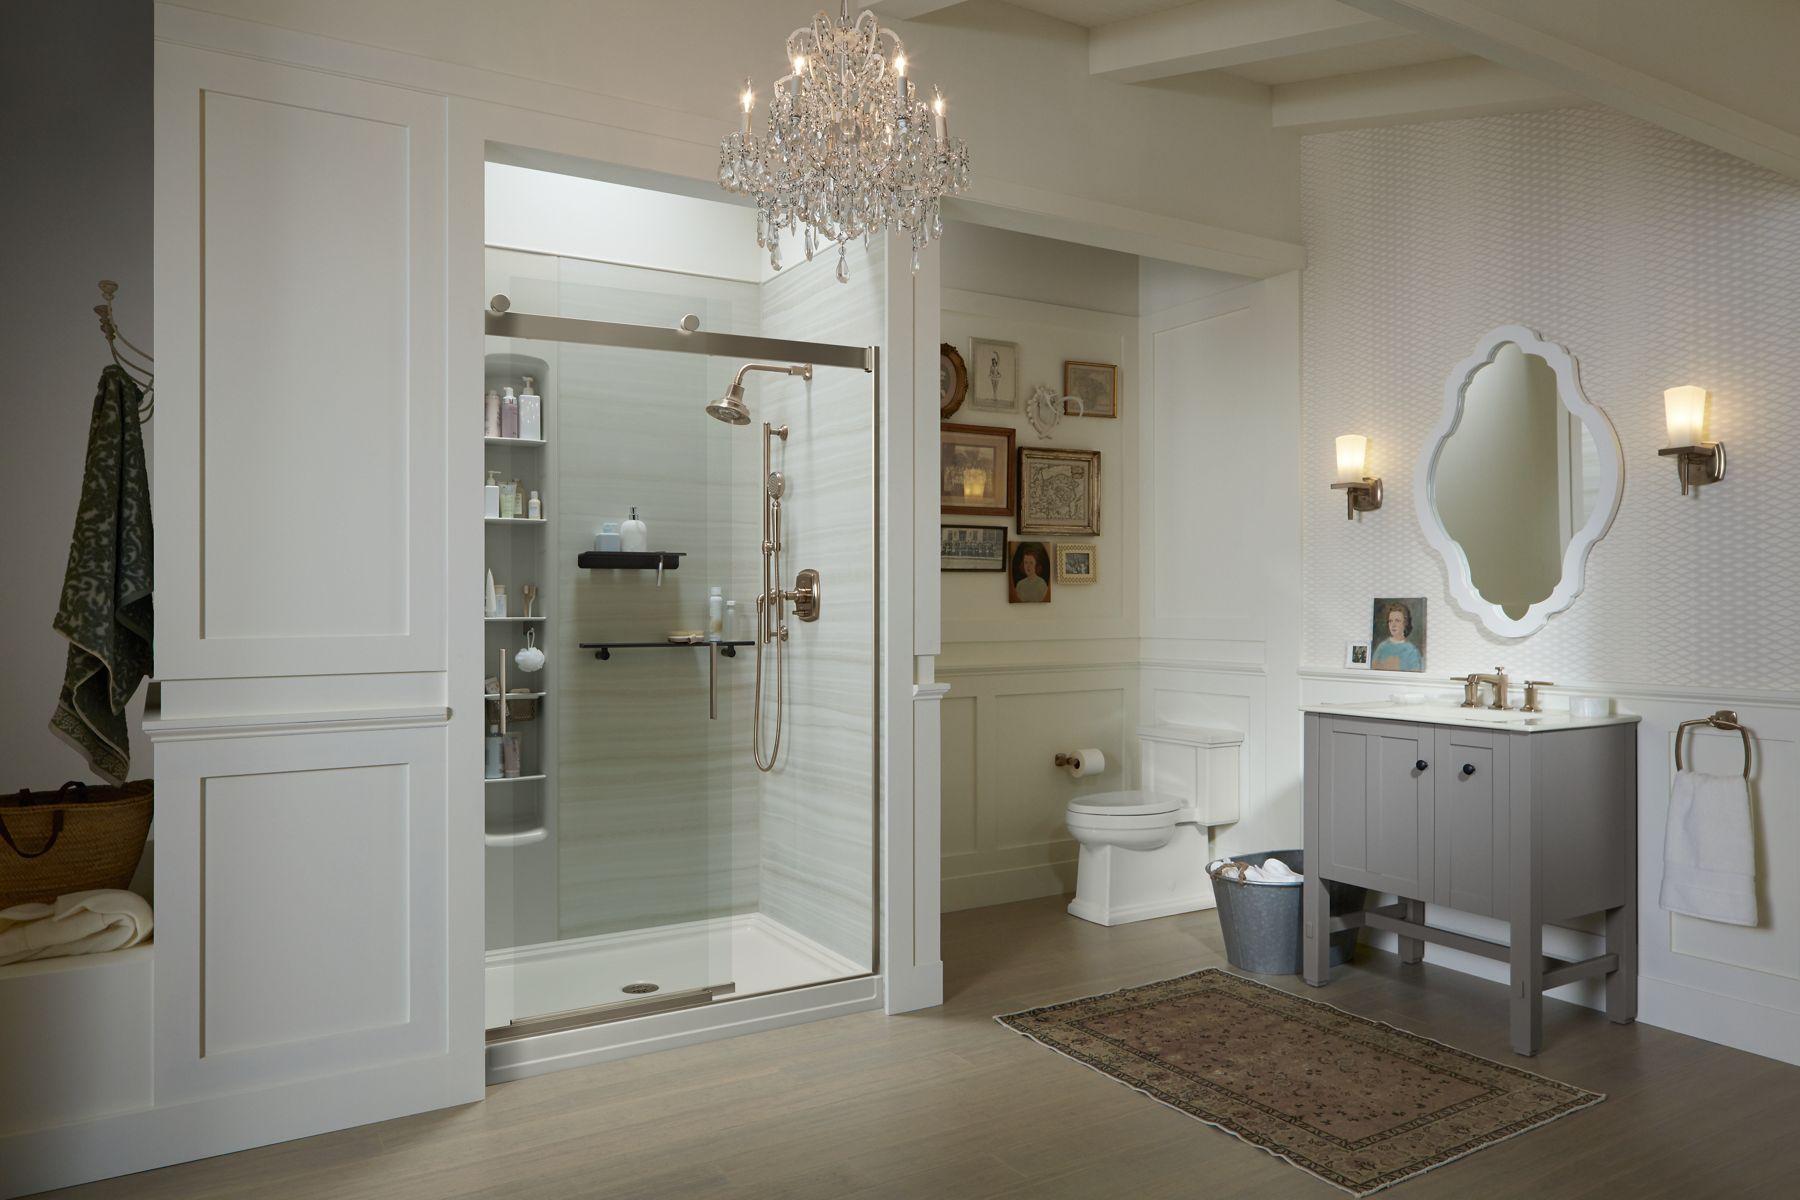 Bathtub Doors Trackless Excellent Bathtub Doors Trackless